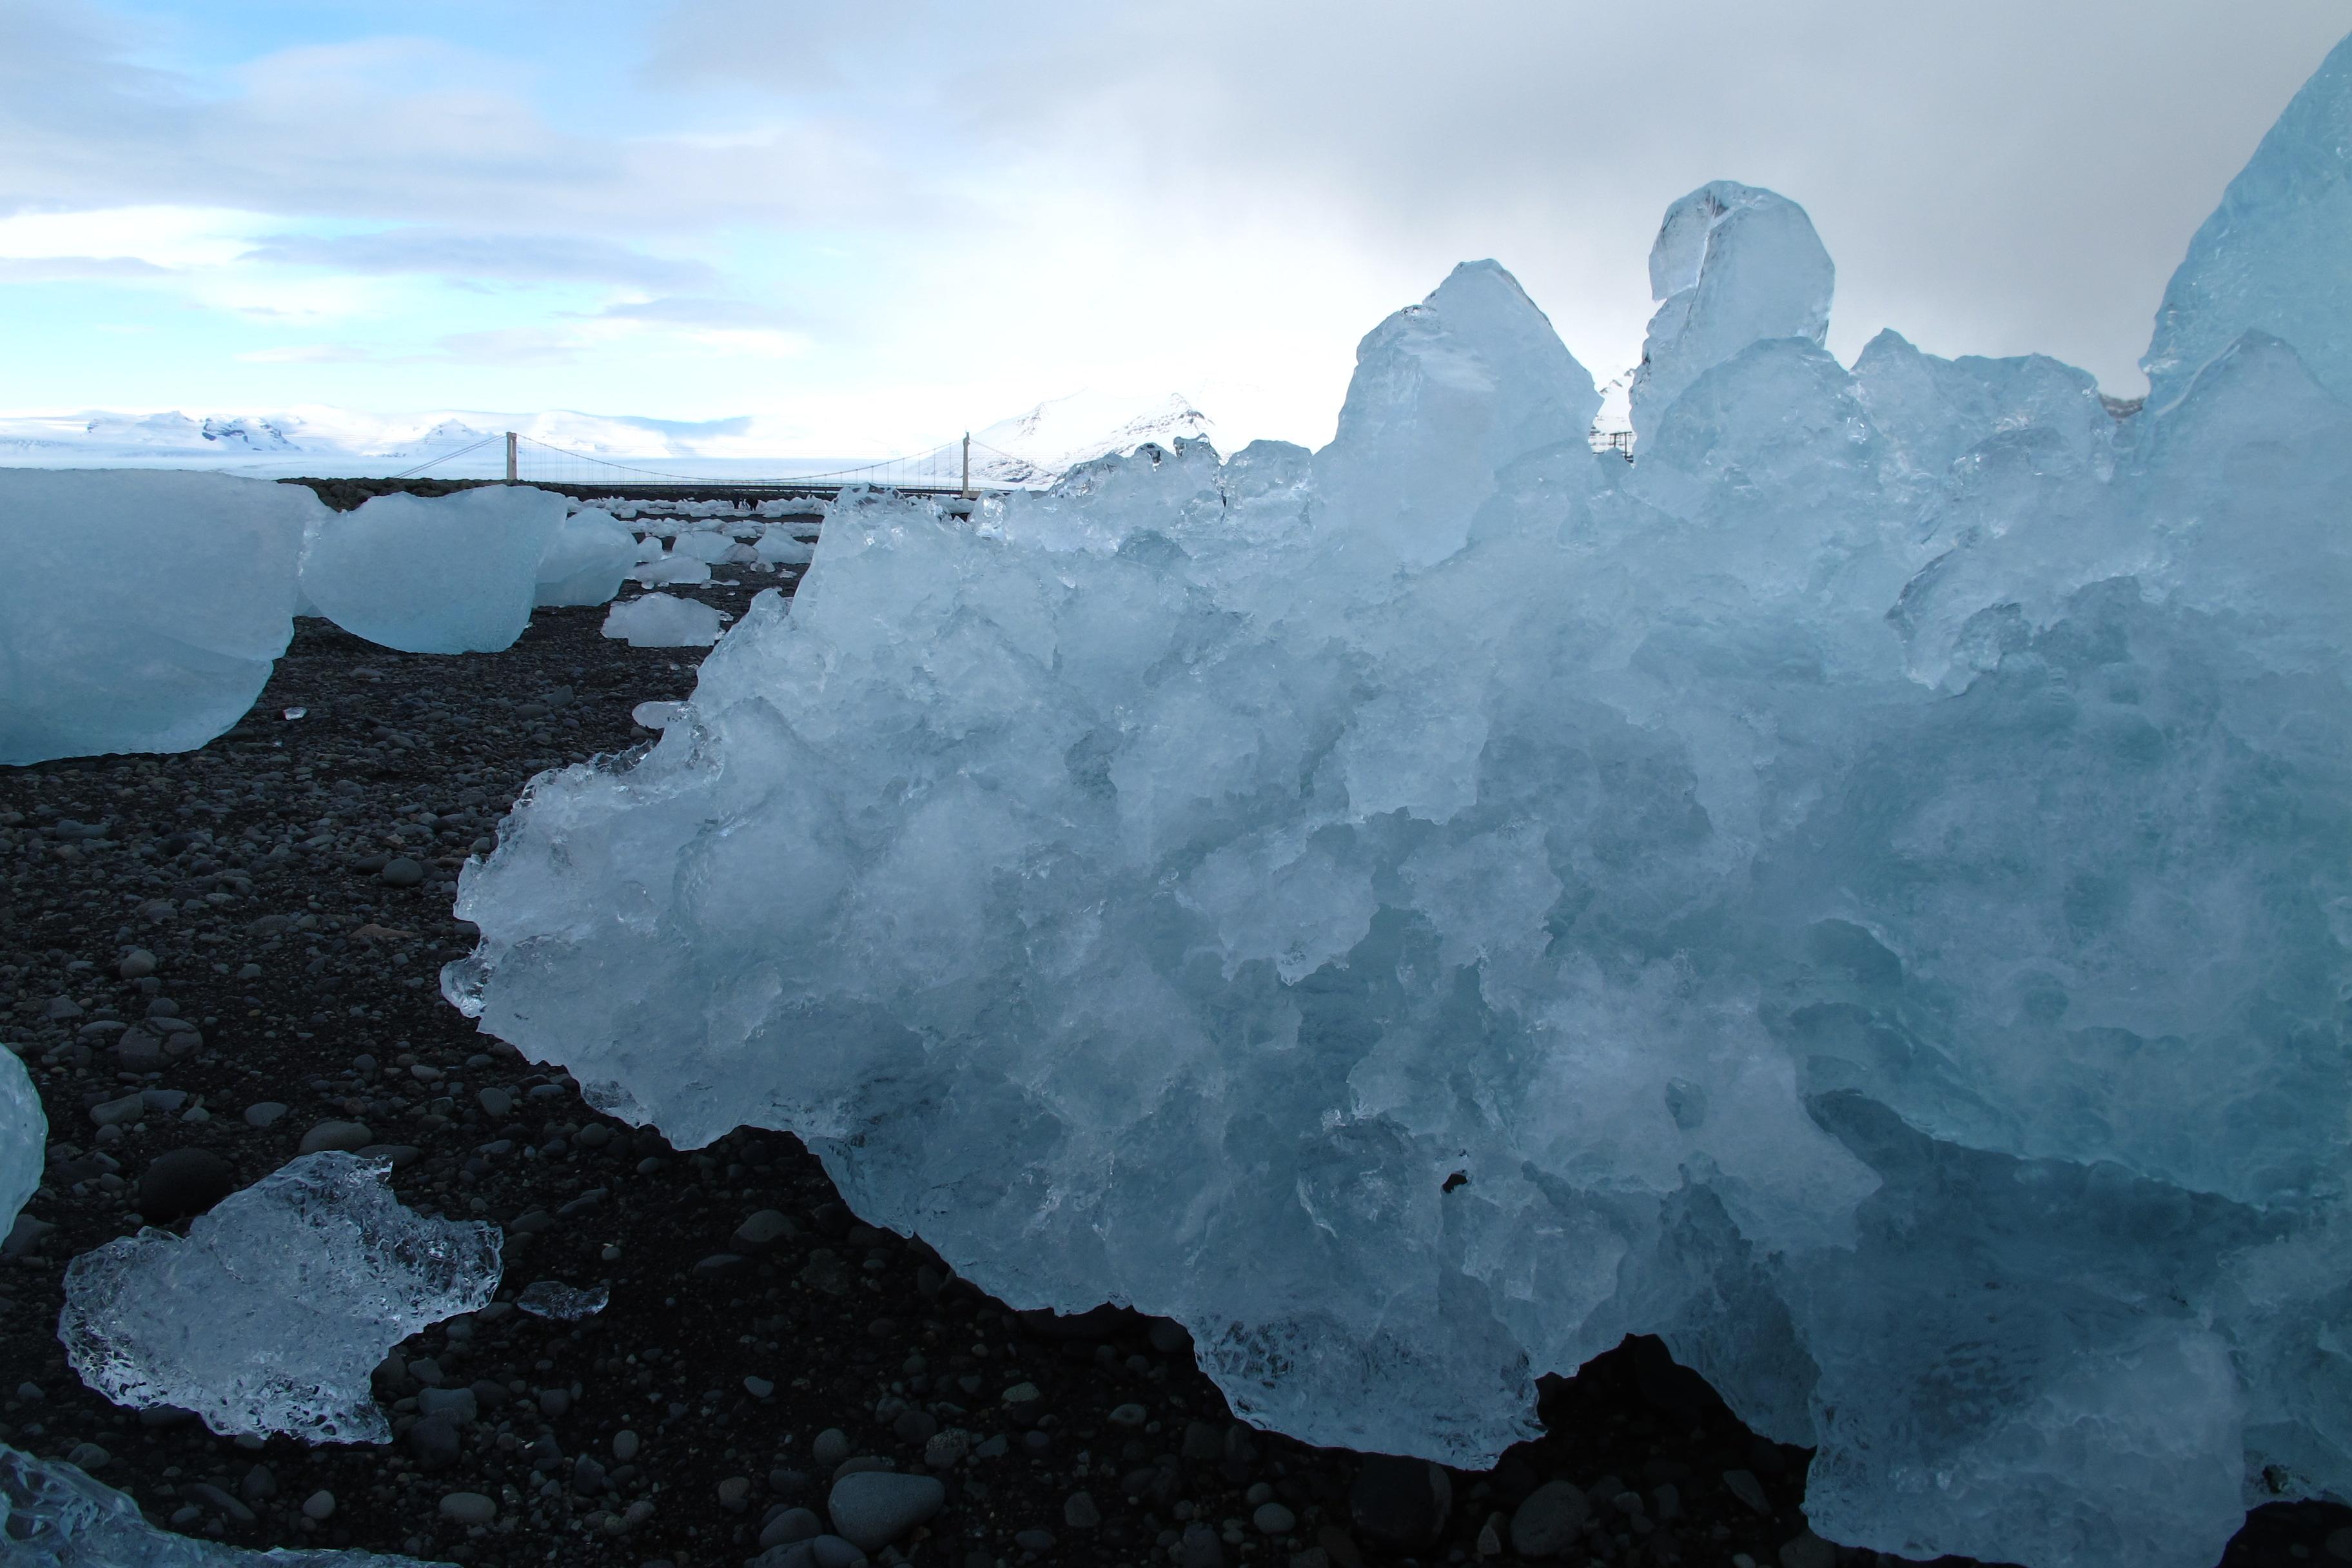 Eis am Strand am Jökulsárlón auf Island.